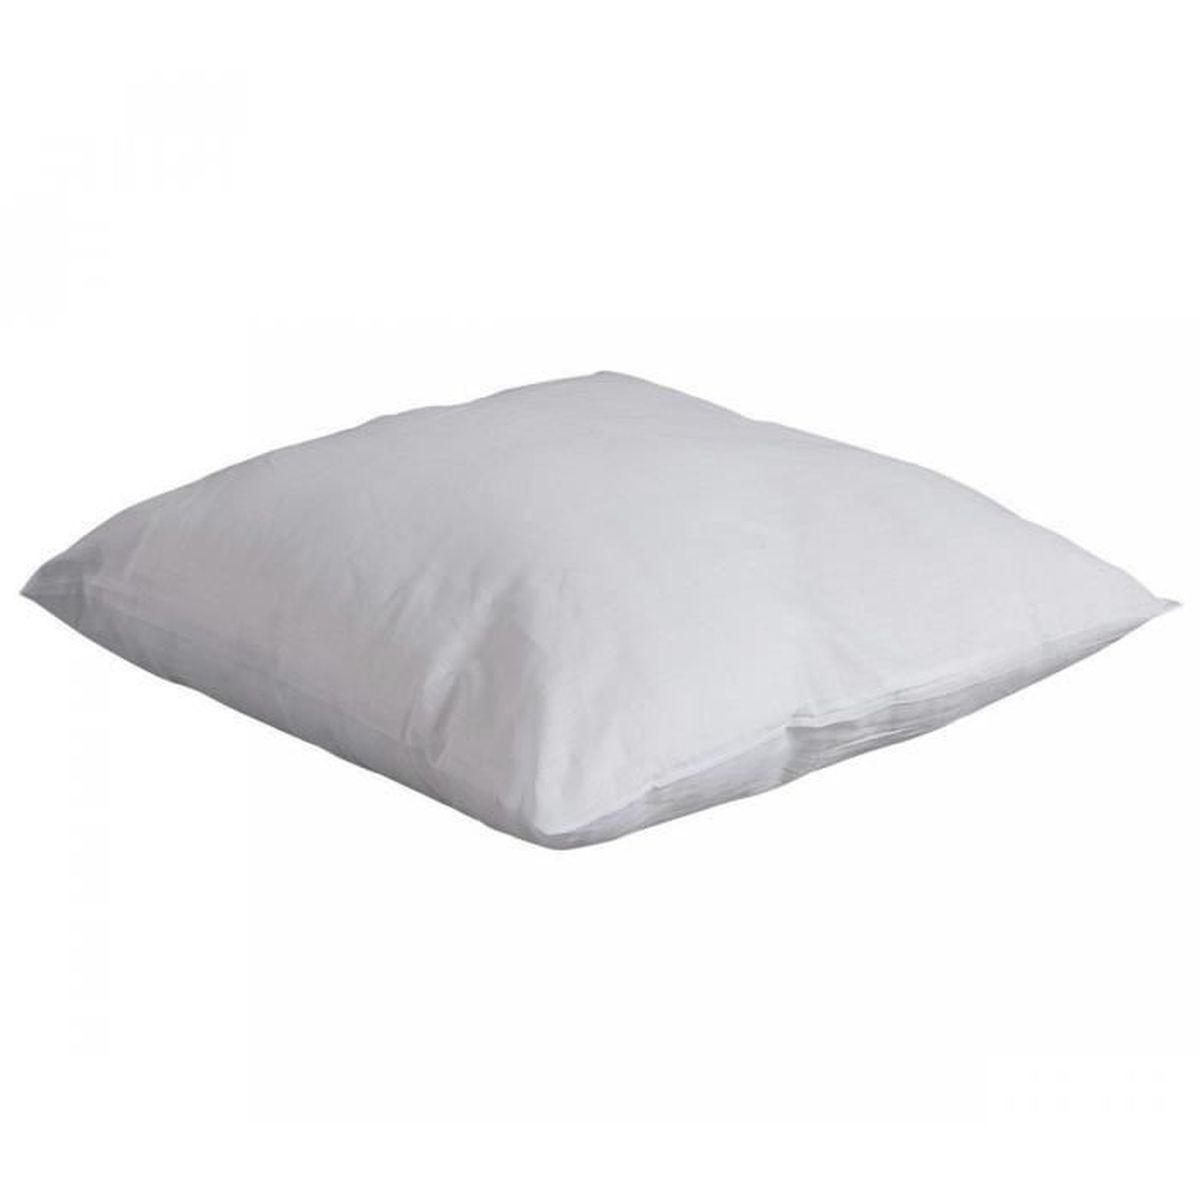 oreiller reve de nuit Pack 2 Oreillers Confort 60x60 Reve de Nuit   Achat / Vente  oreiller reve de nuit